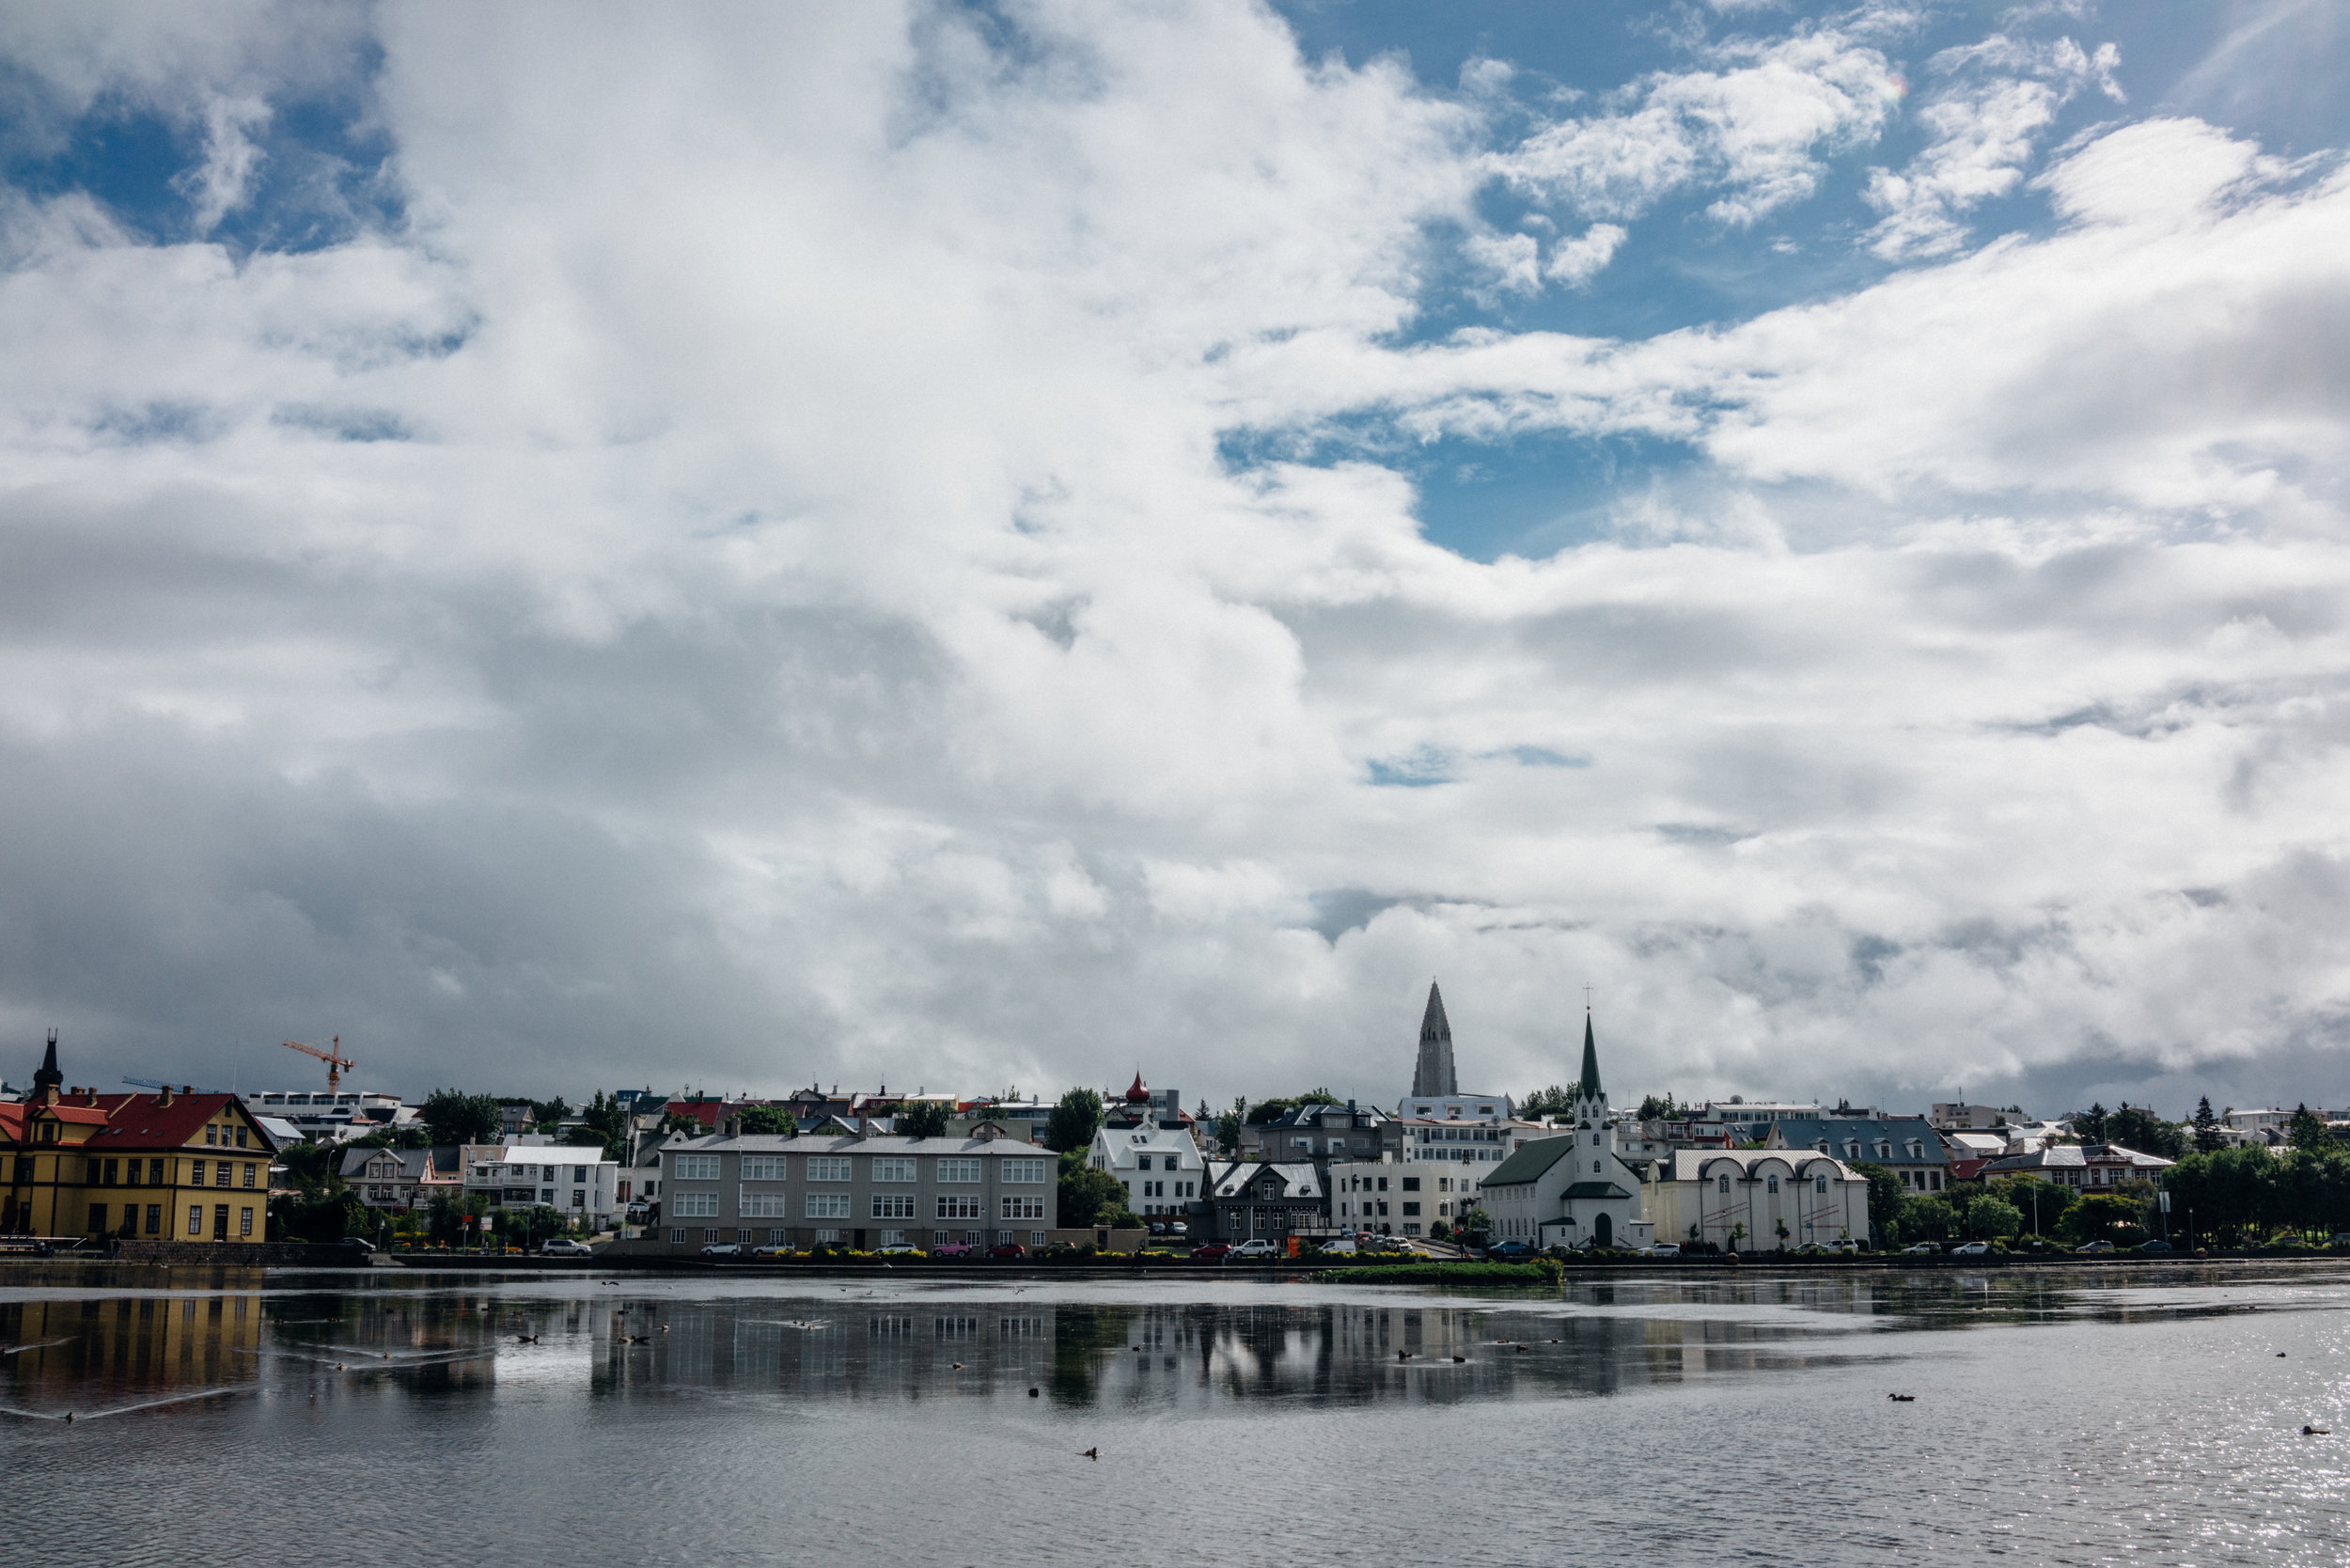 Looking across at Reykjavík through Reykjavíkurtjörn, not far from  Alþingishúsið ,or Althing, Iceland's national parliament, also the oldest legislature in the world that still exists.